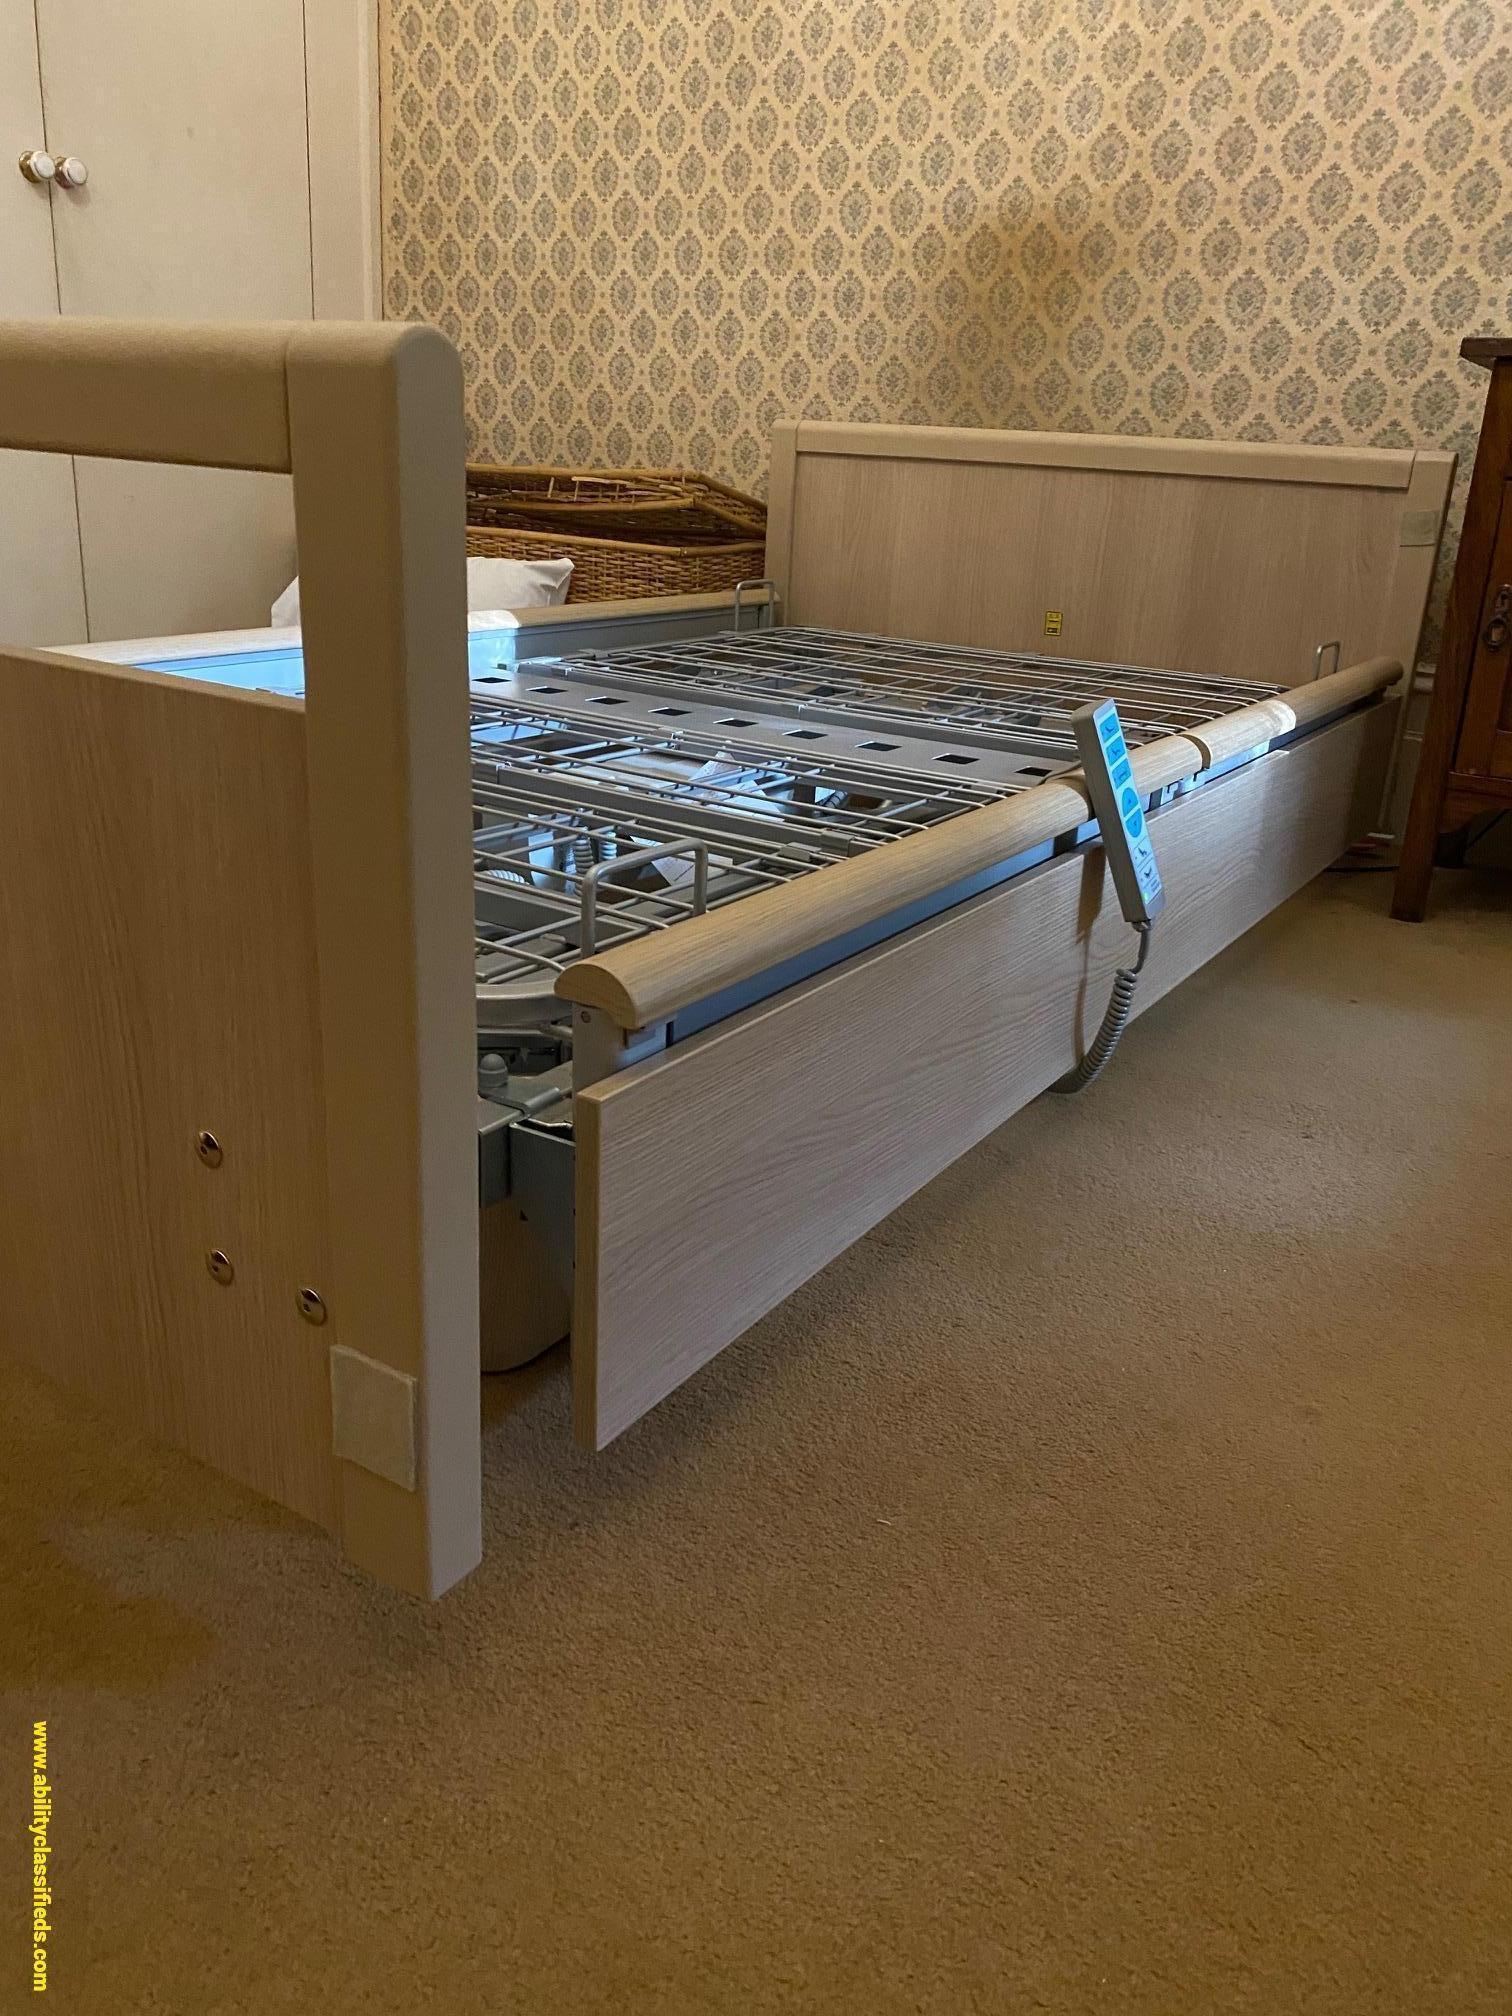 Sendida 5 king single hospital style electric bed